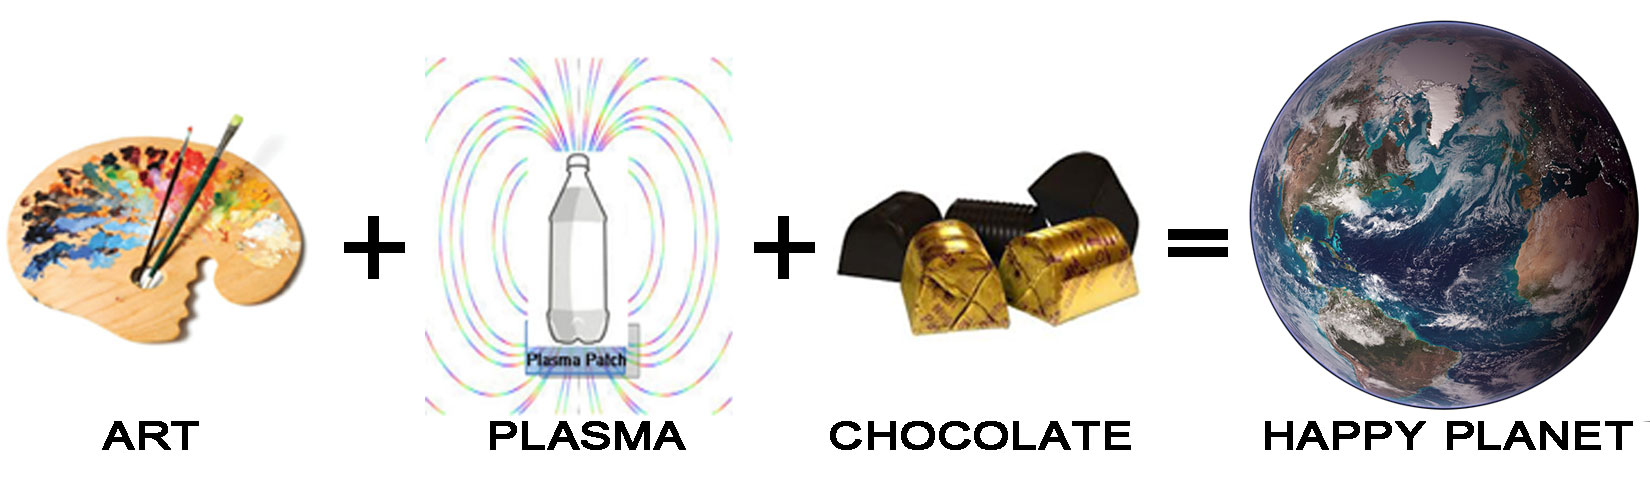 Art, Plasma and Chocolate make a happy world